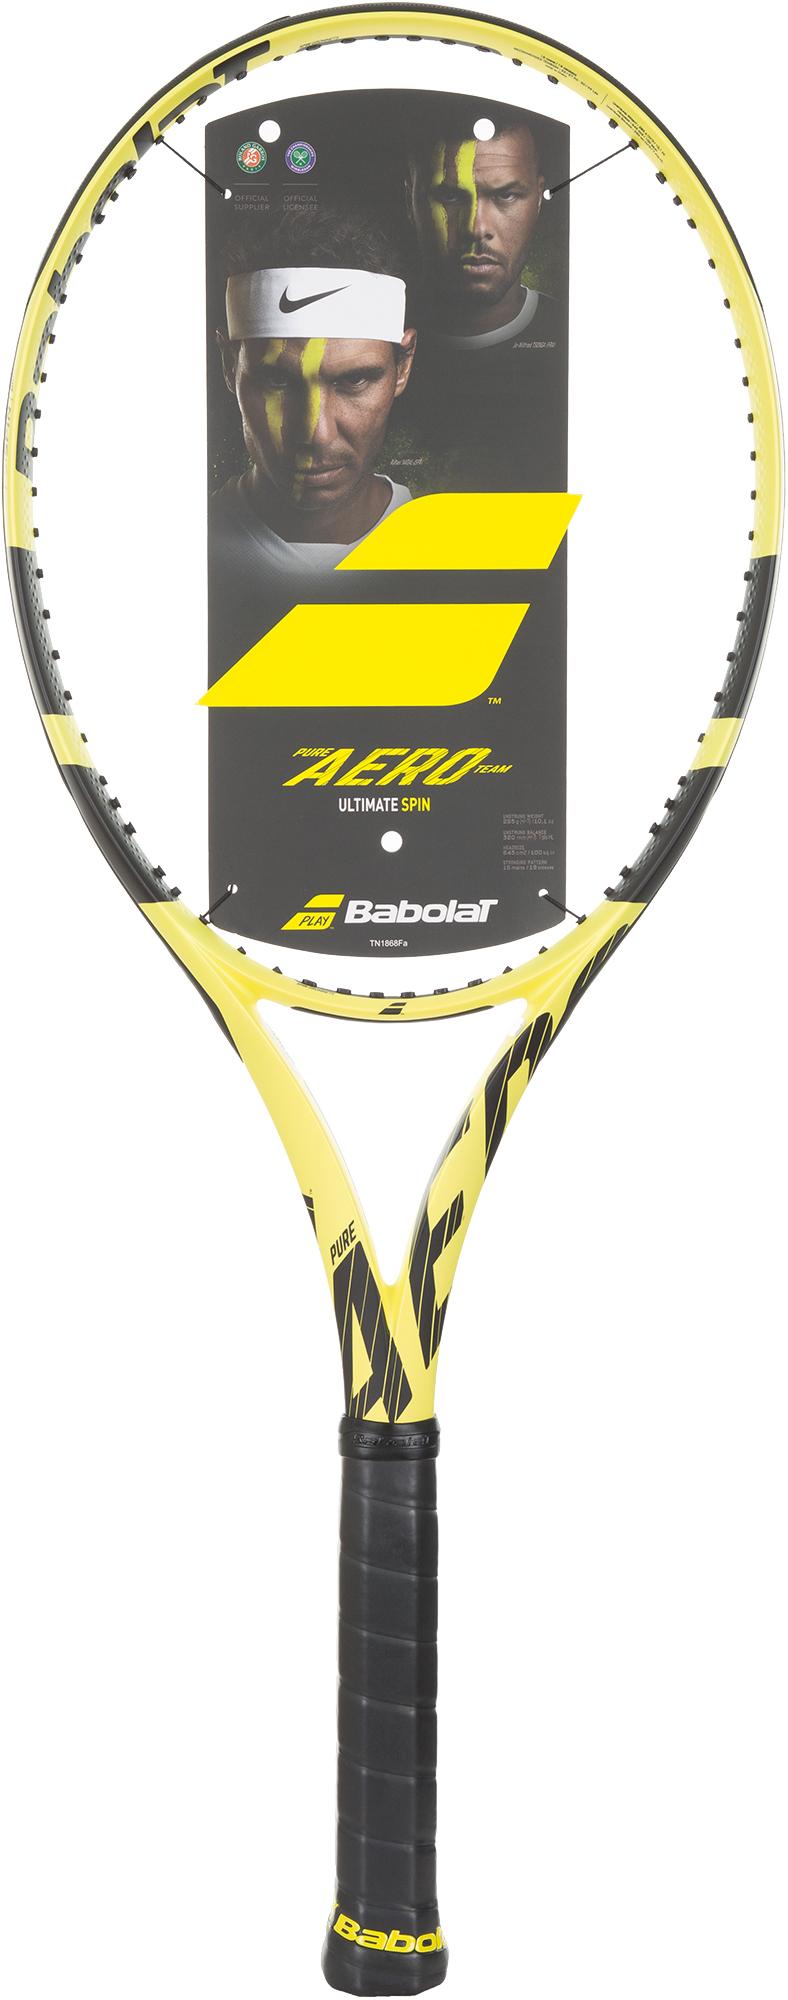 Babolat Ракетка для большого тенниса Babolat Pure Aero Team babolat ракетка для большого тенниса детская babolat aero junior 25 размер без размера